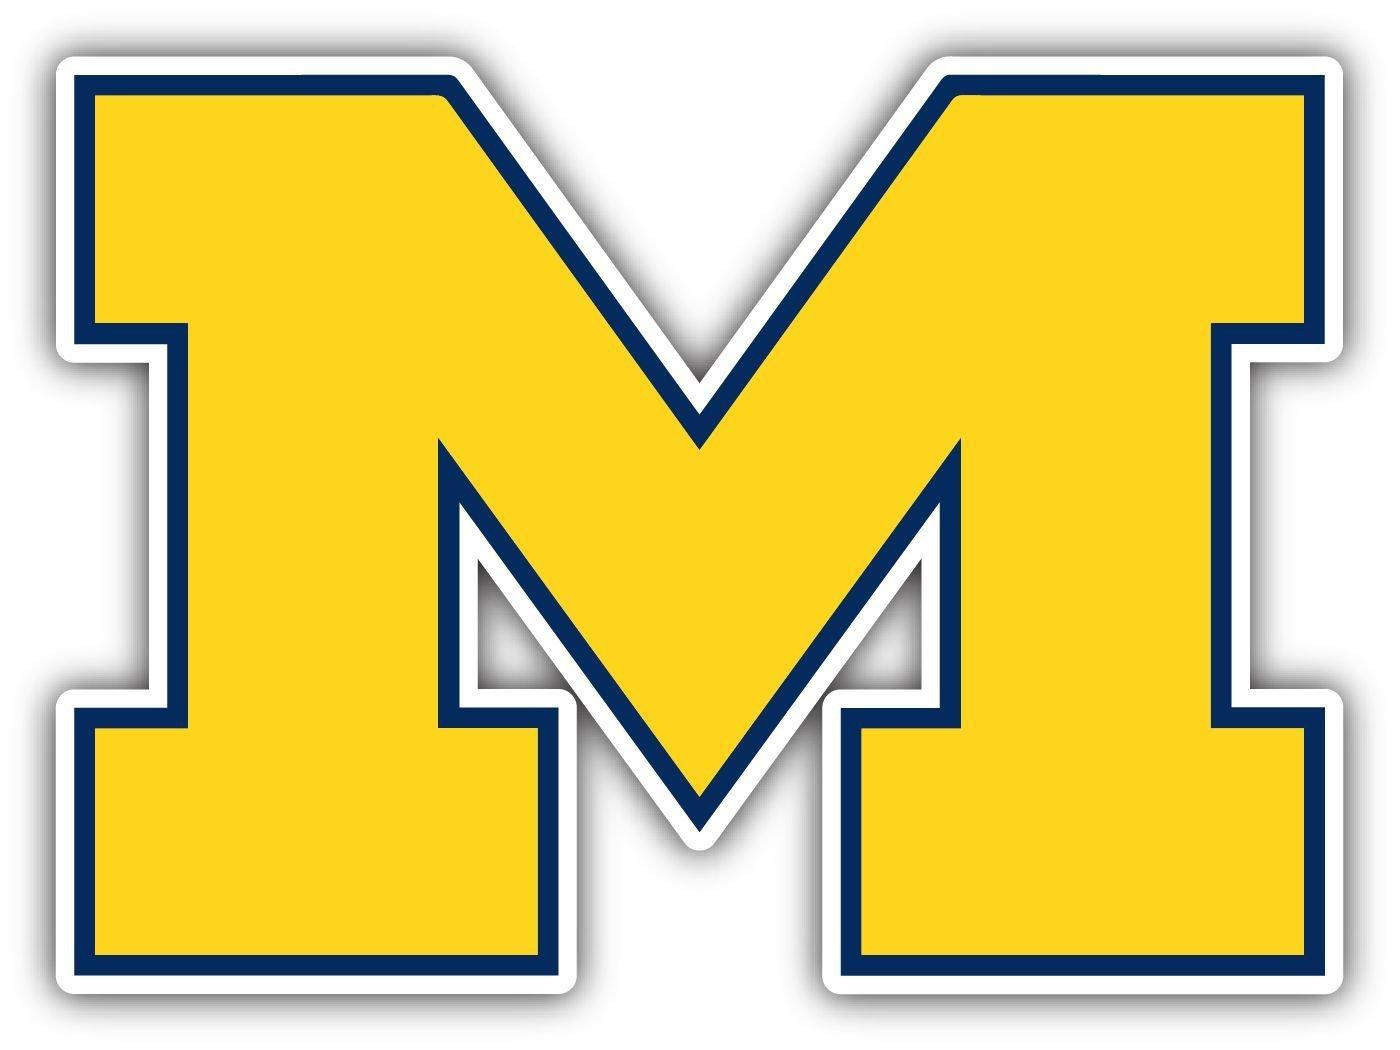 4 Inch Full Color Michigan Wolverines Yellow M Logo Vinyl Decal Yeti Laptop Car Window Sticker 00015